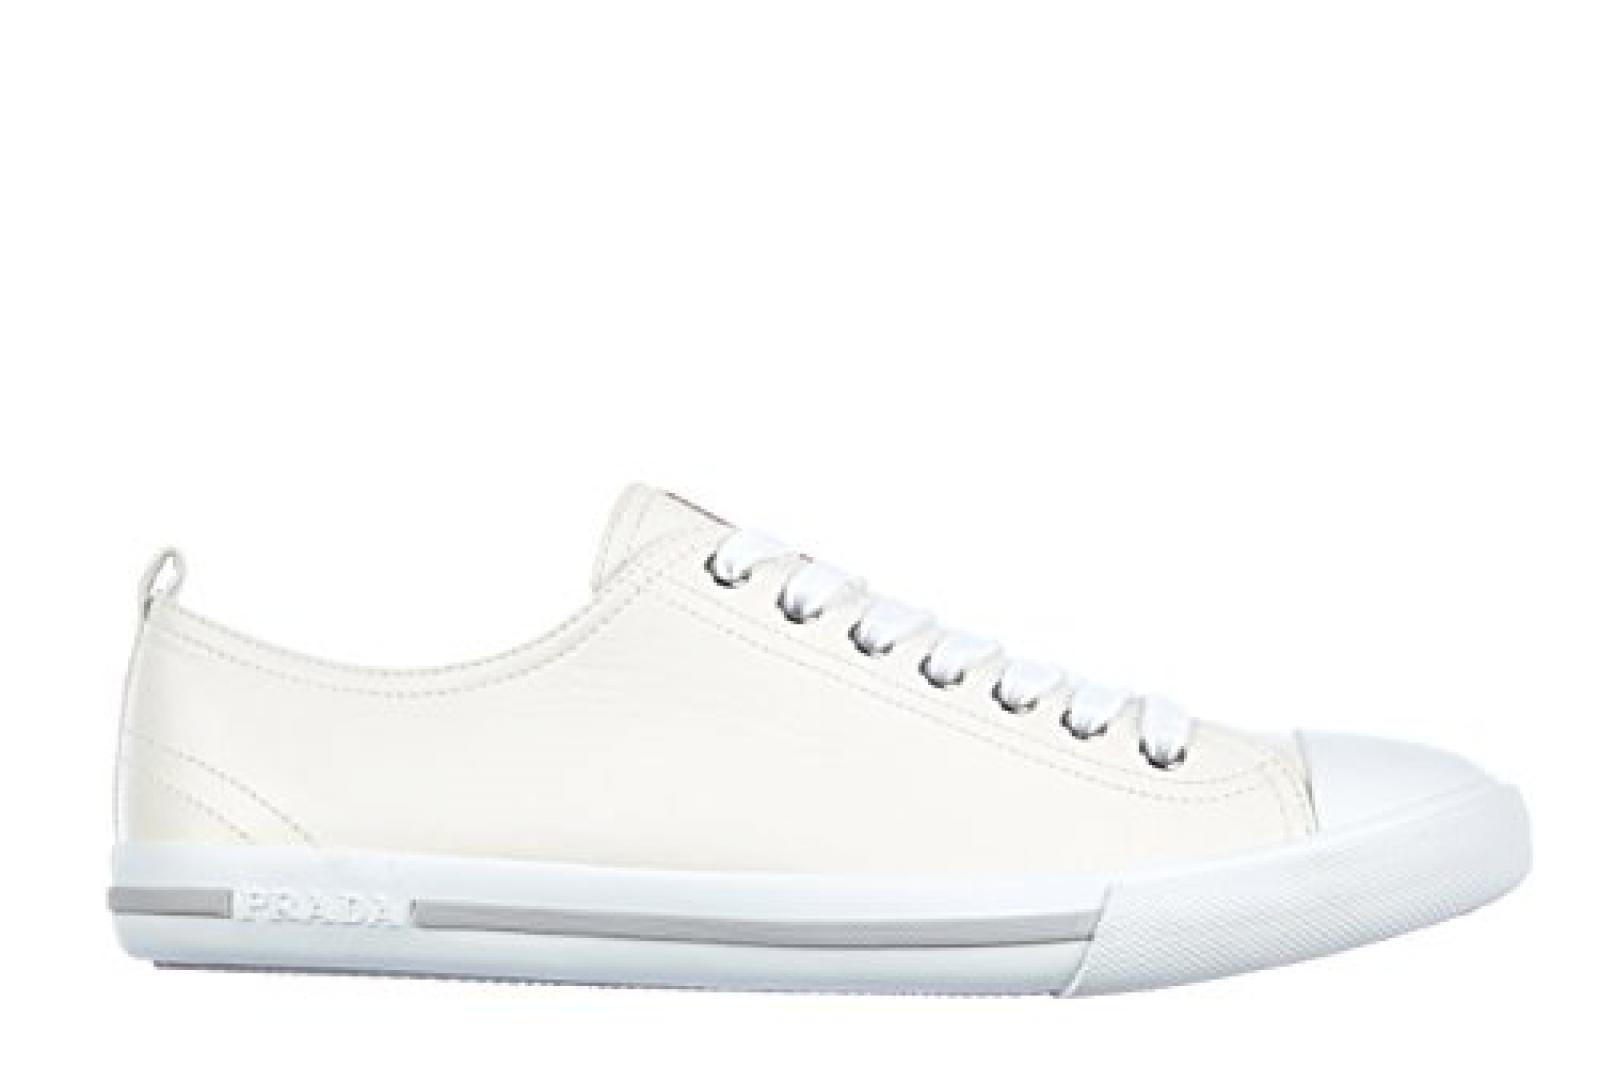 Prada Herrenschuhe Herren Leder Schuhe Sneakers nappa Weiß